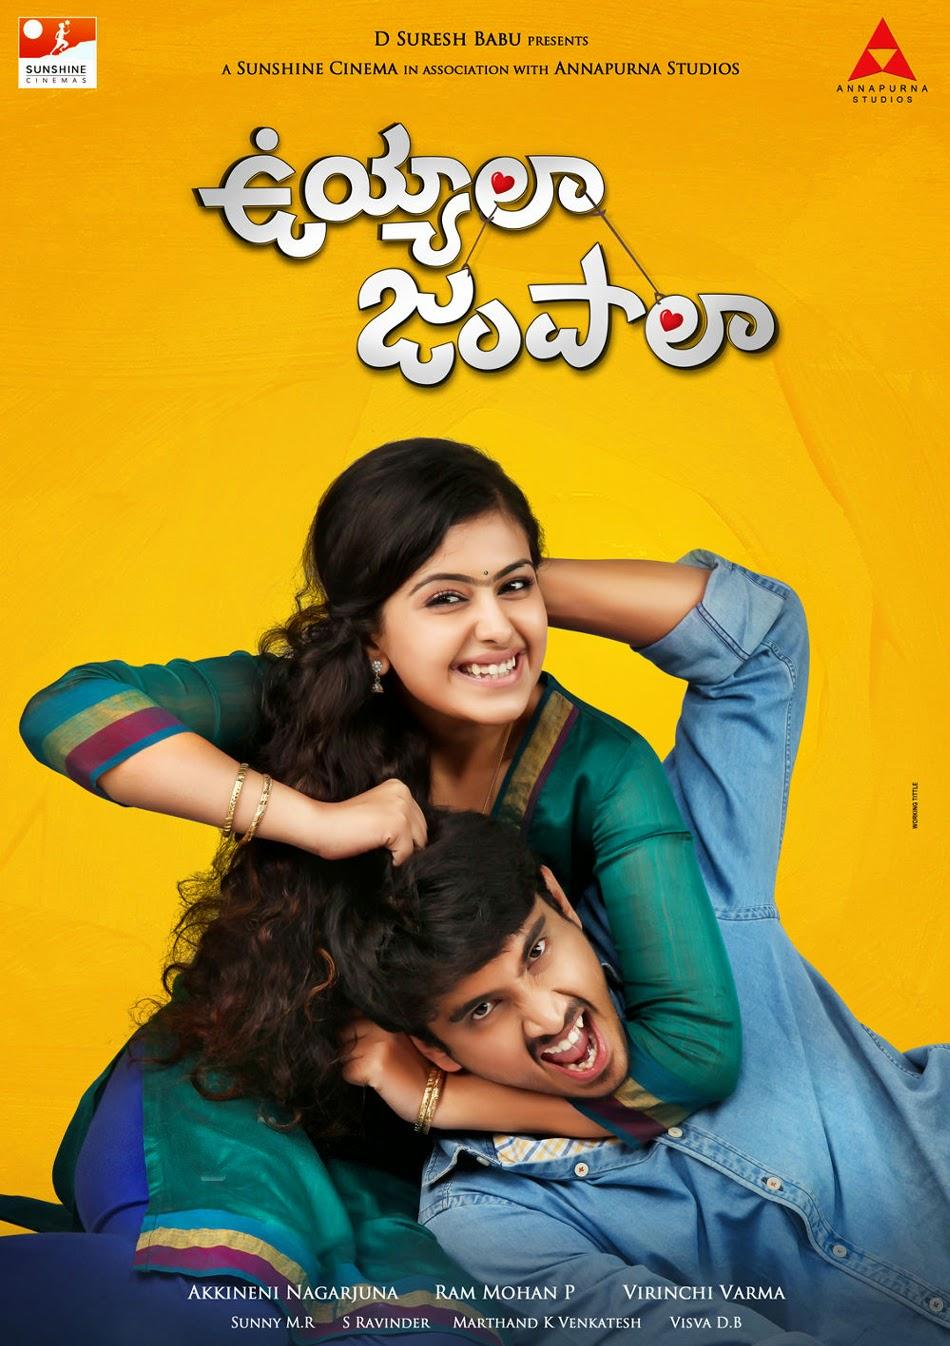 Uyyala Jampala Movie First Look Posters Uyyala Jampala Movie First Look Posters  281 29